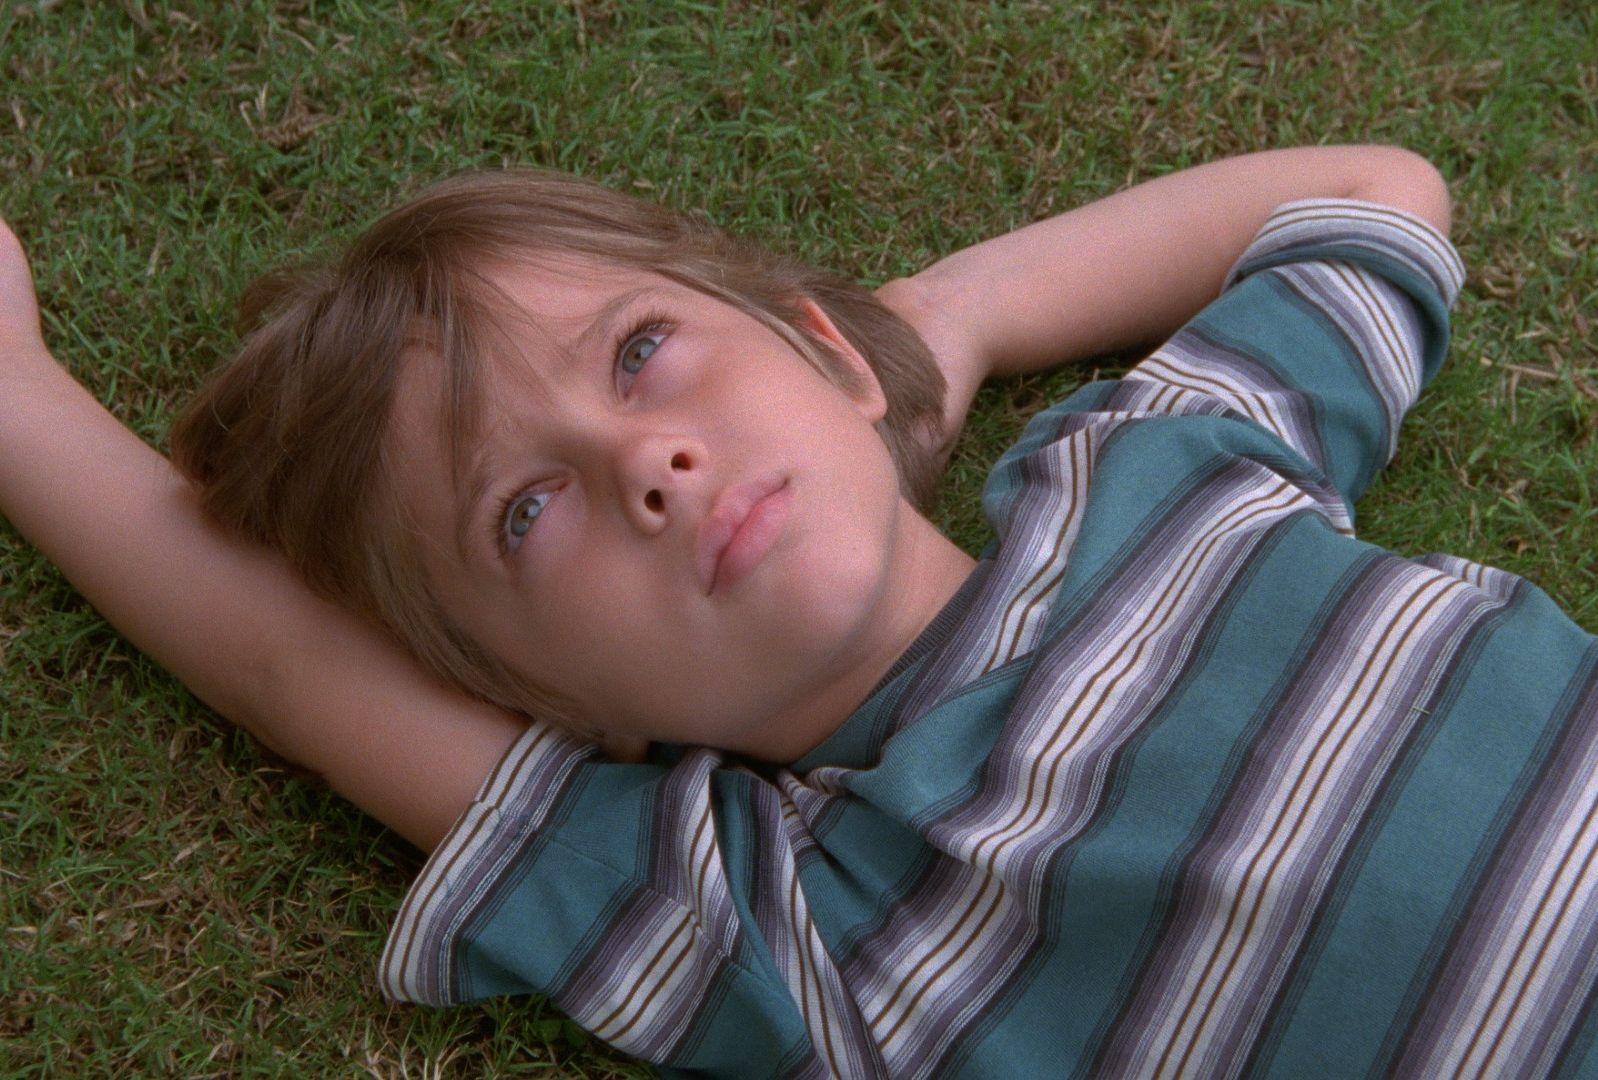 Richard Linklater follows boy for 12 years